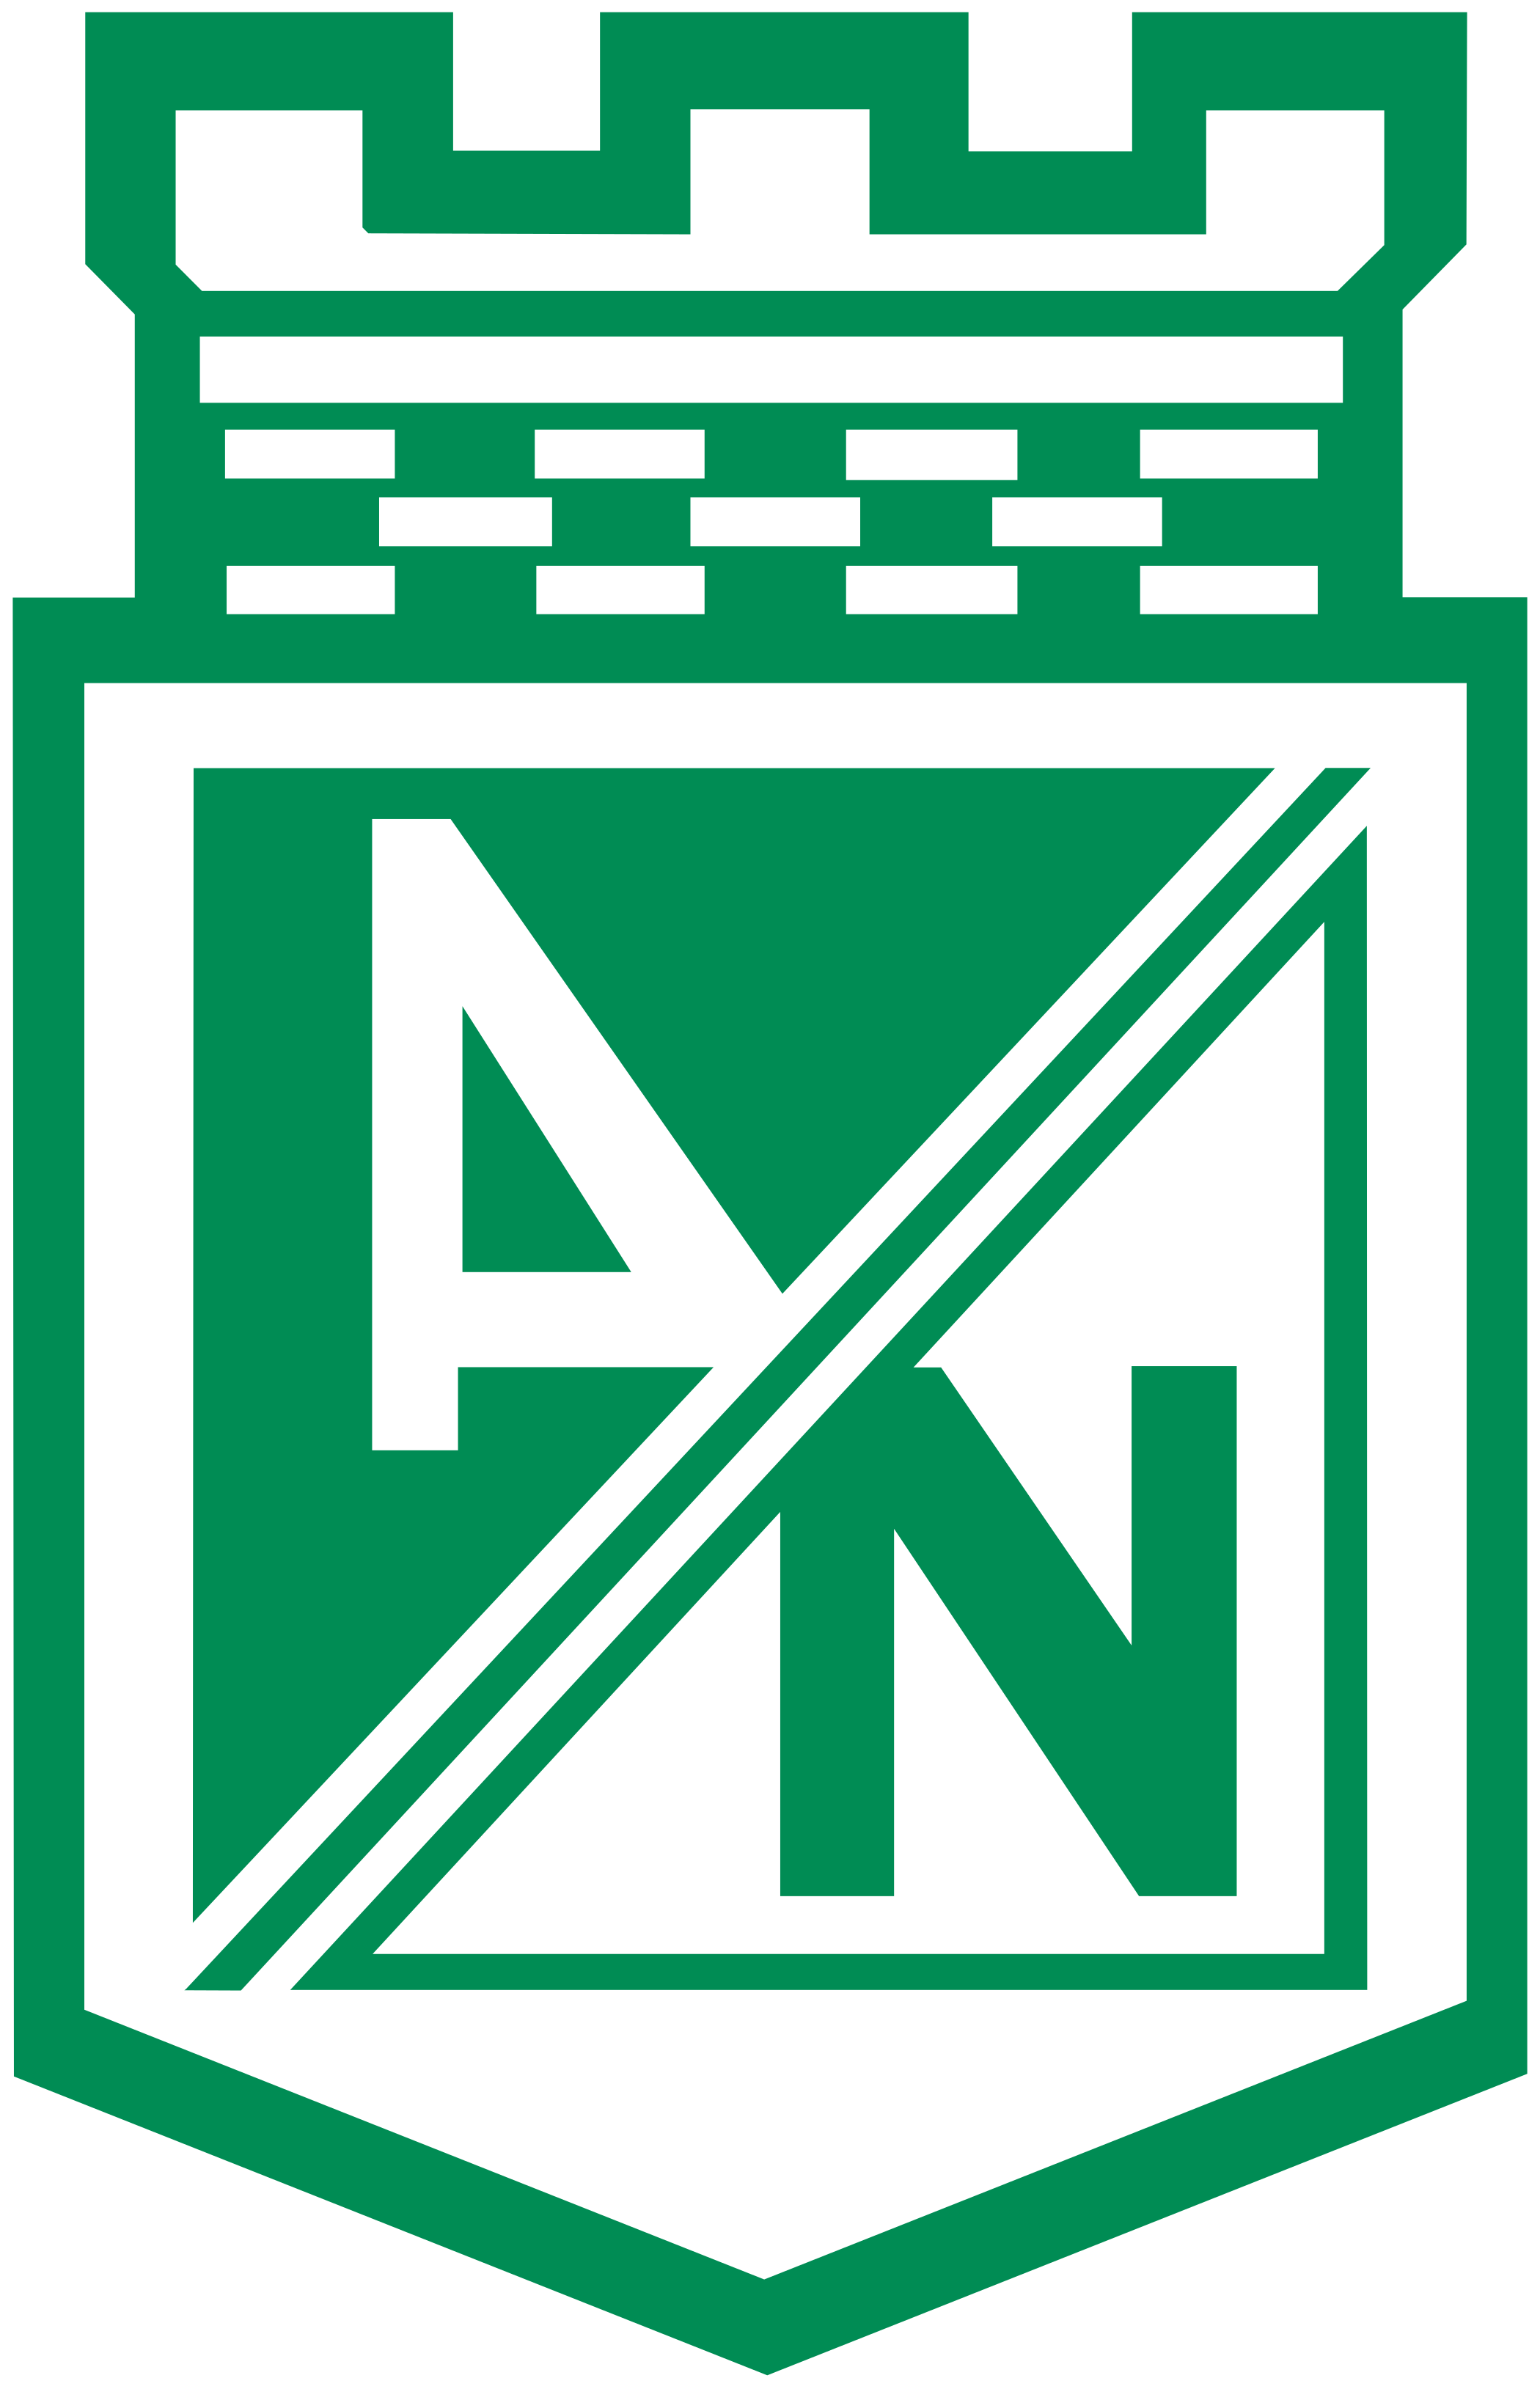 atletico nacional logo escudo 1 - Club Atlético Nacional Logo - Escudo